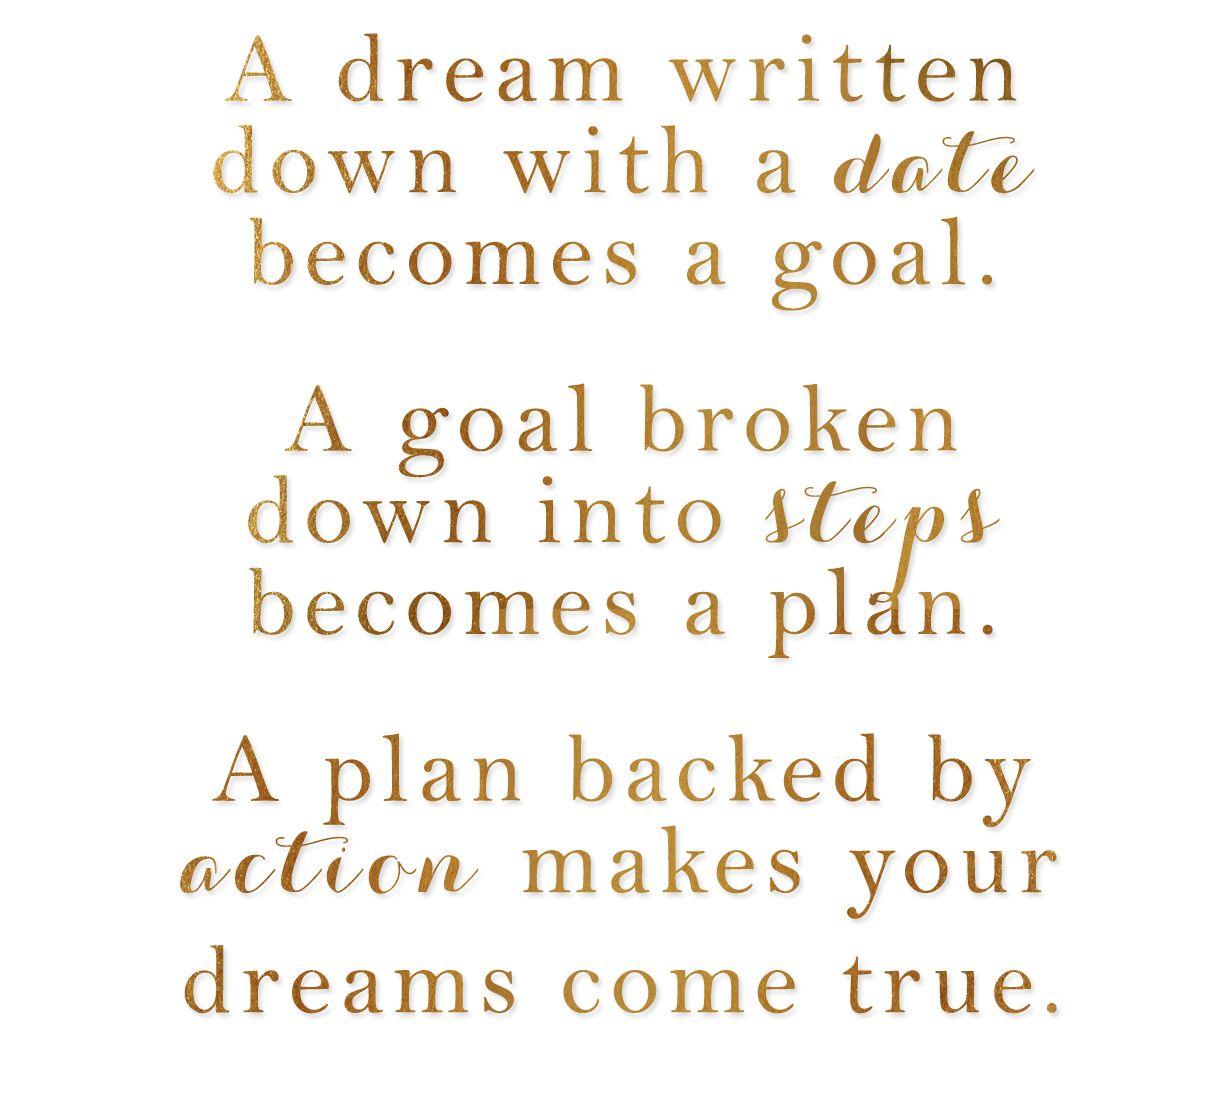 Dreams come true httpgo4prophotosa new you plan words dreams come true httpgo4prophotosa new you altavistaventures Image collections